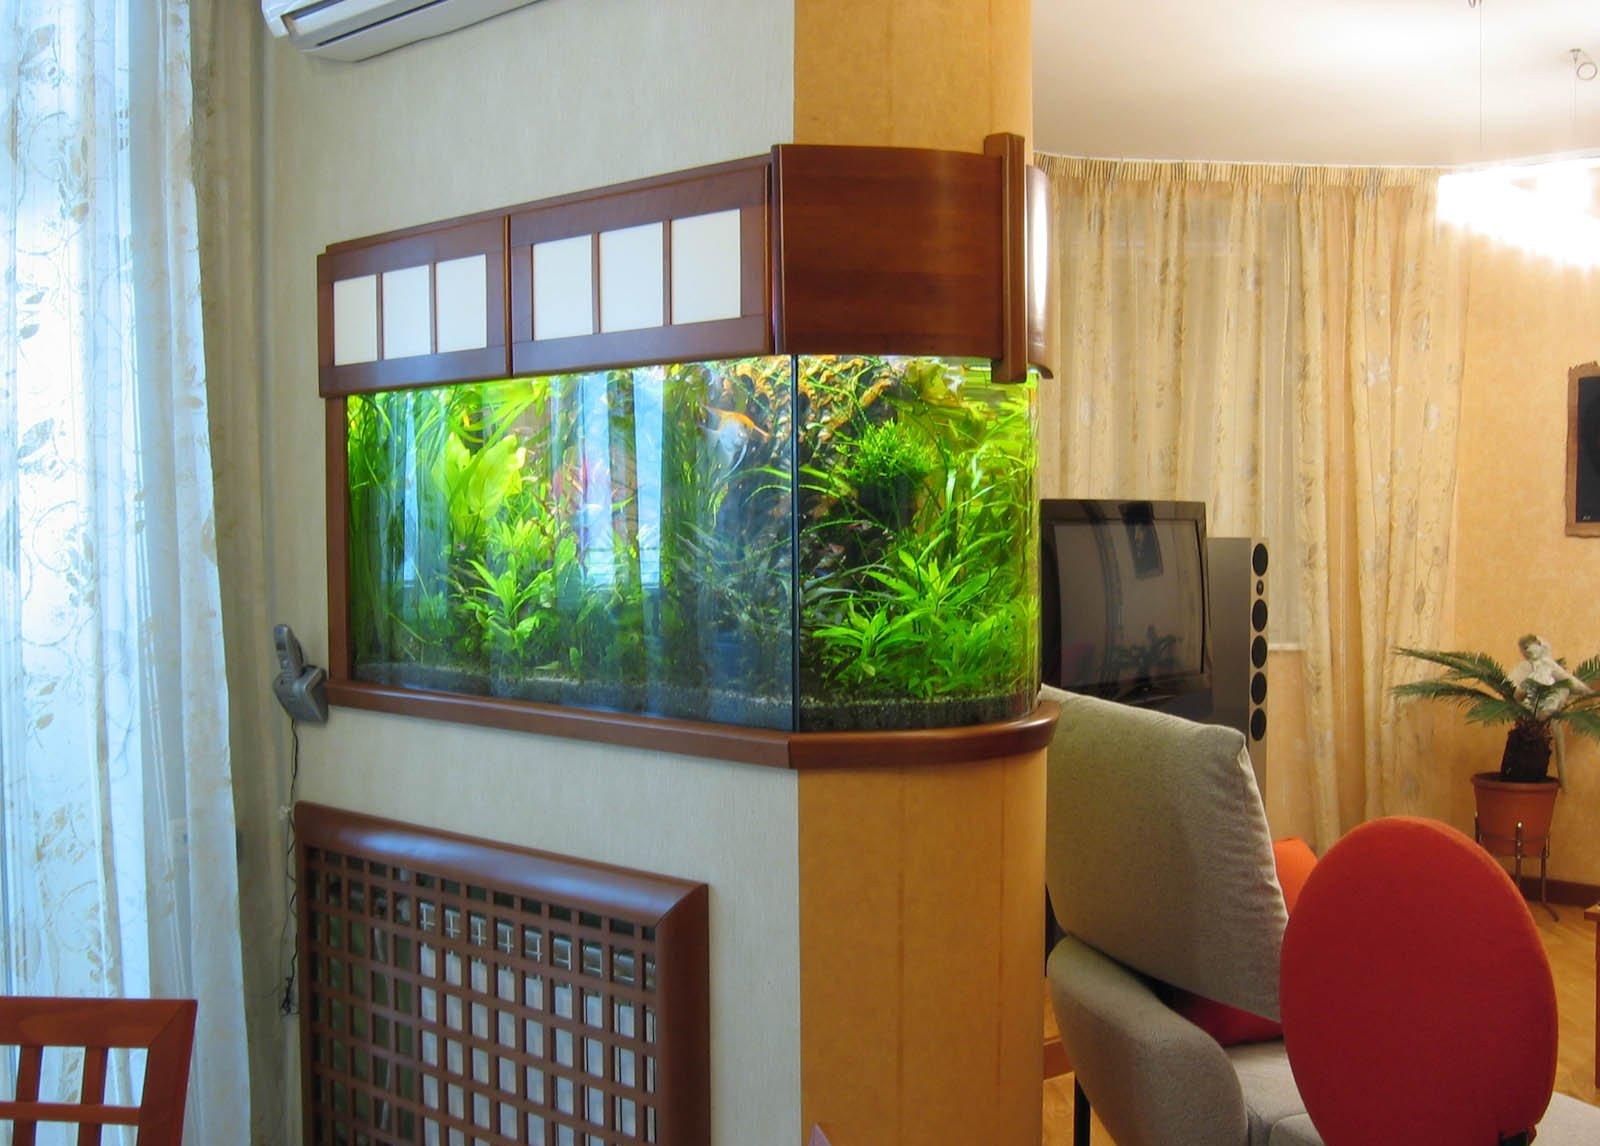 Аквариум в интерьере квартиры (фото)